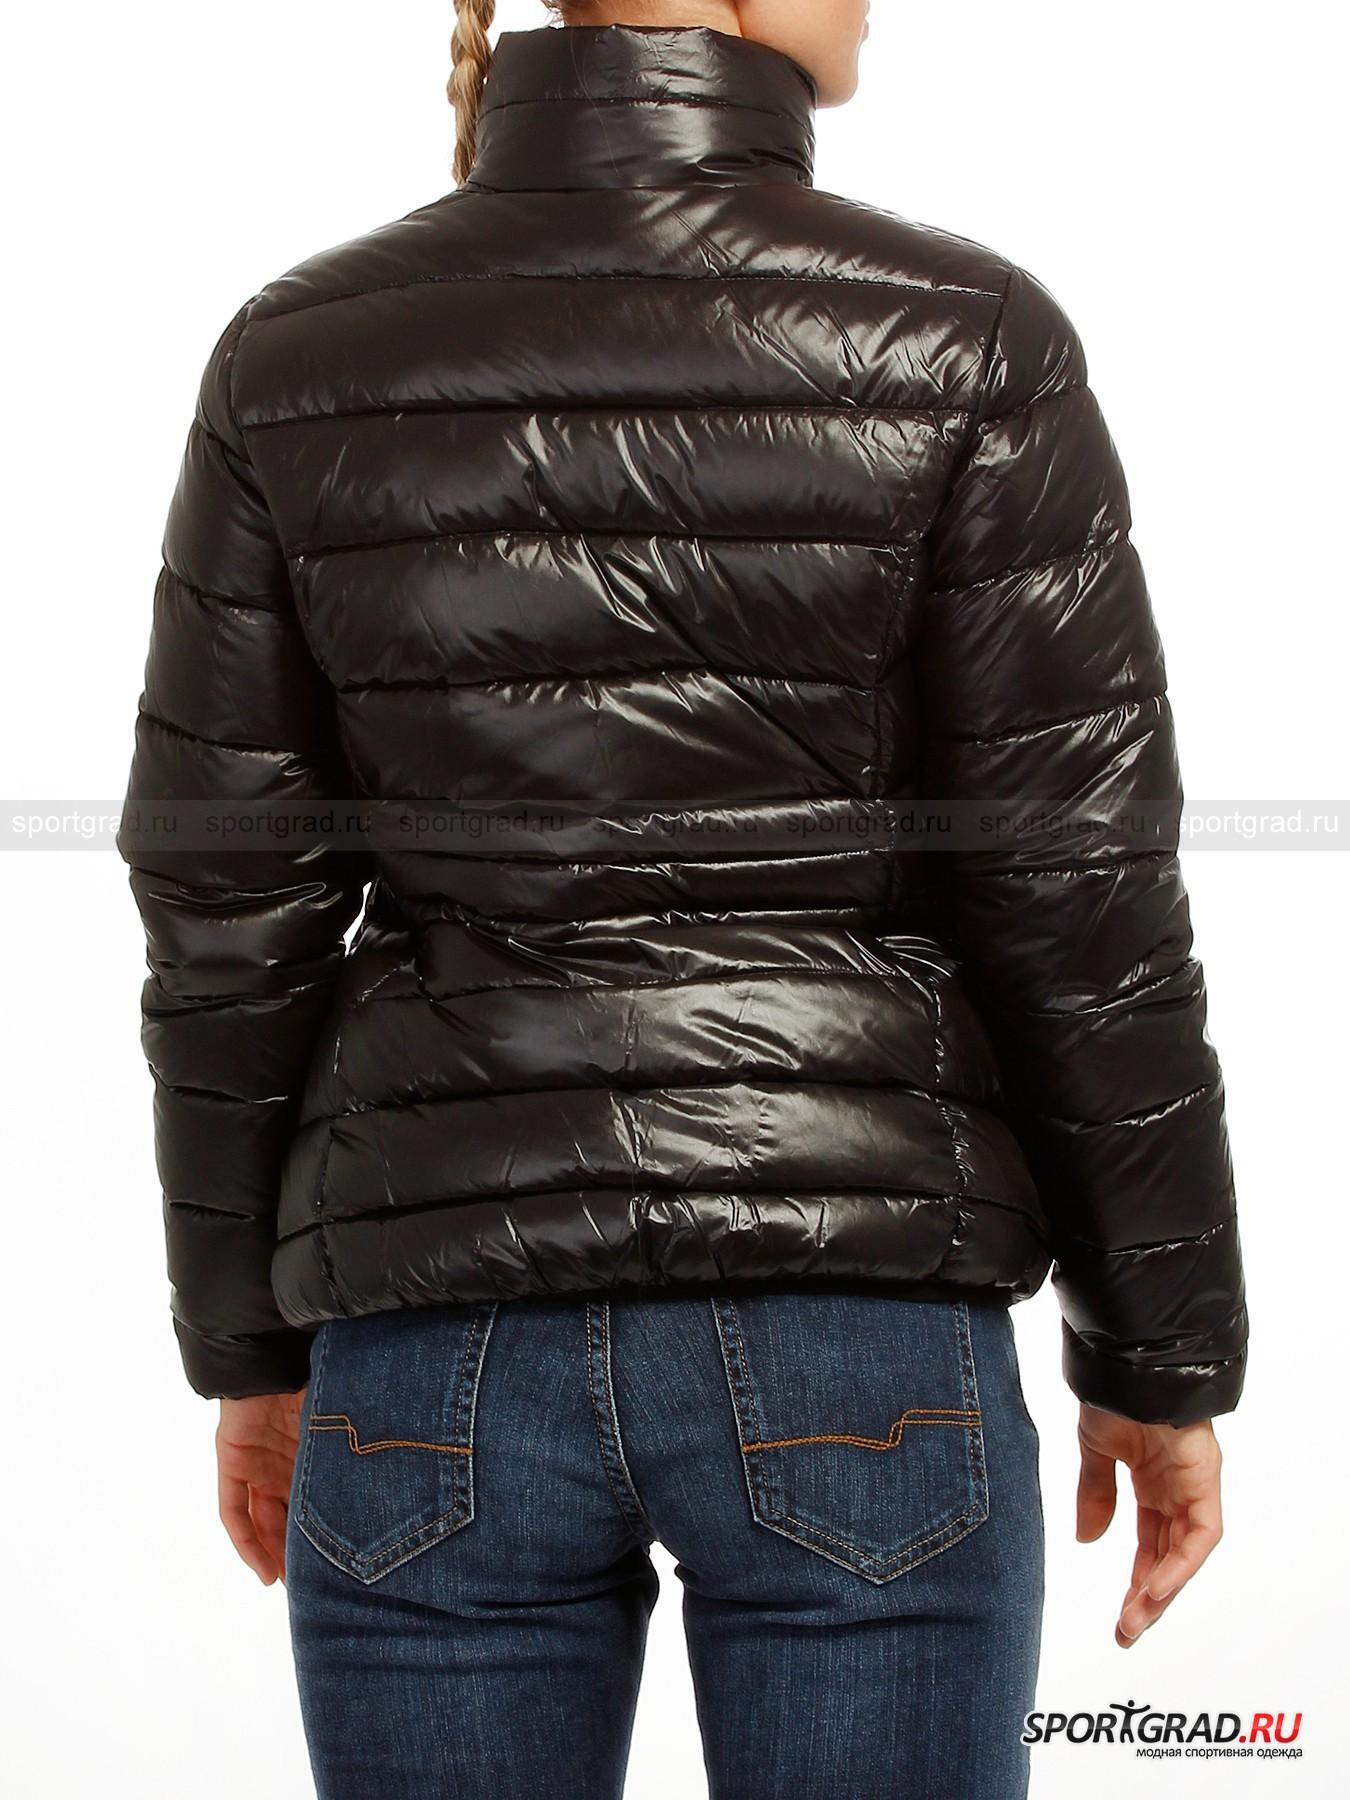 Куртка женская LADY JACKET CAMPAGNOLO от Спортград